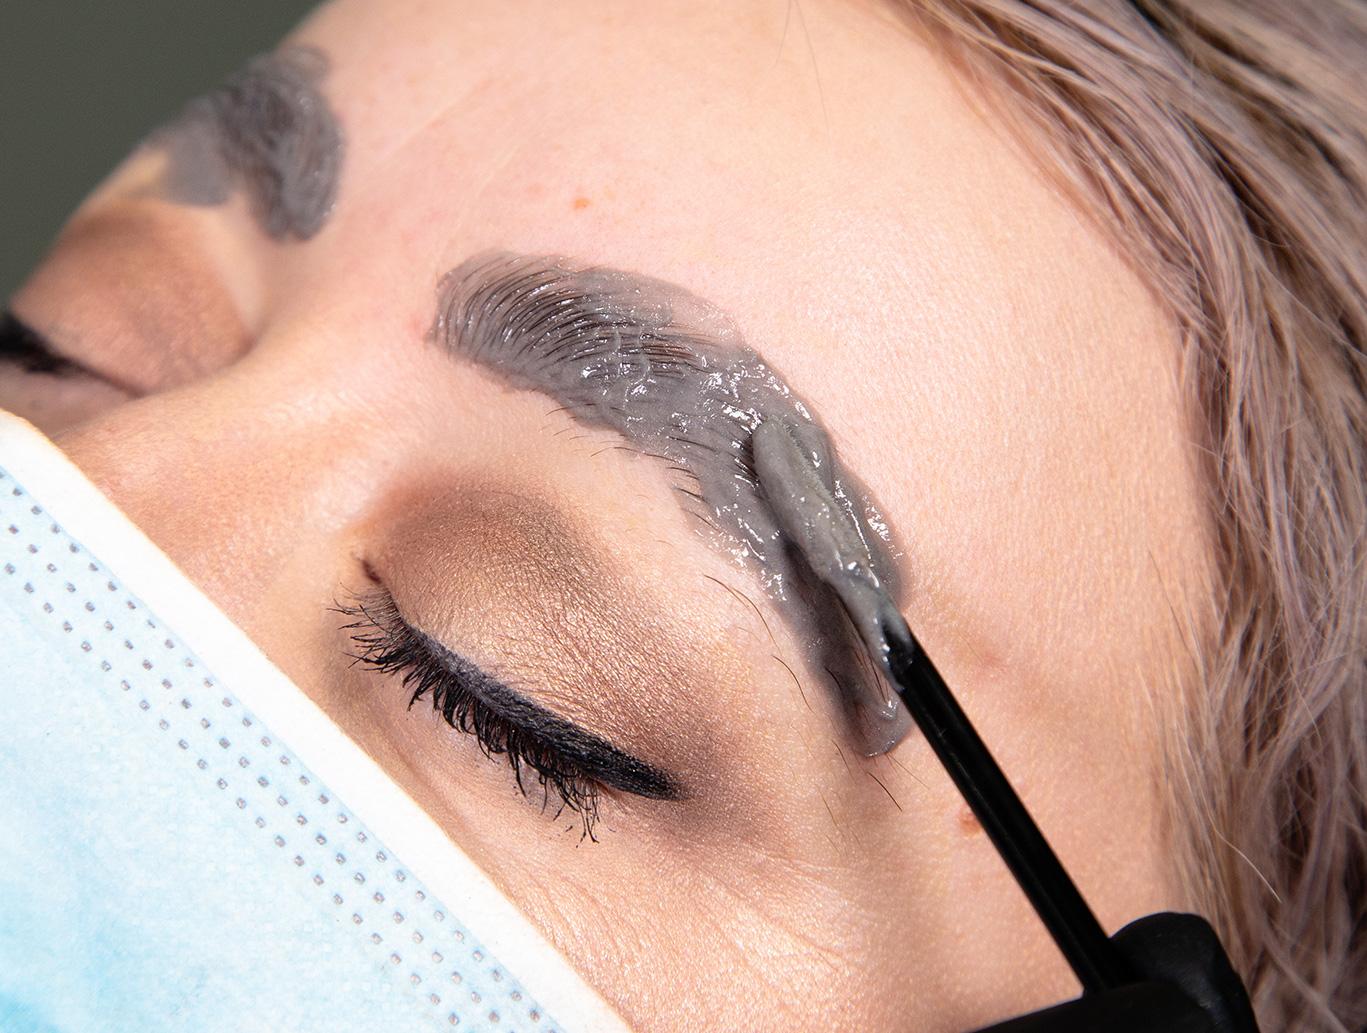 eyebrow tint last longer